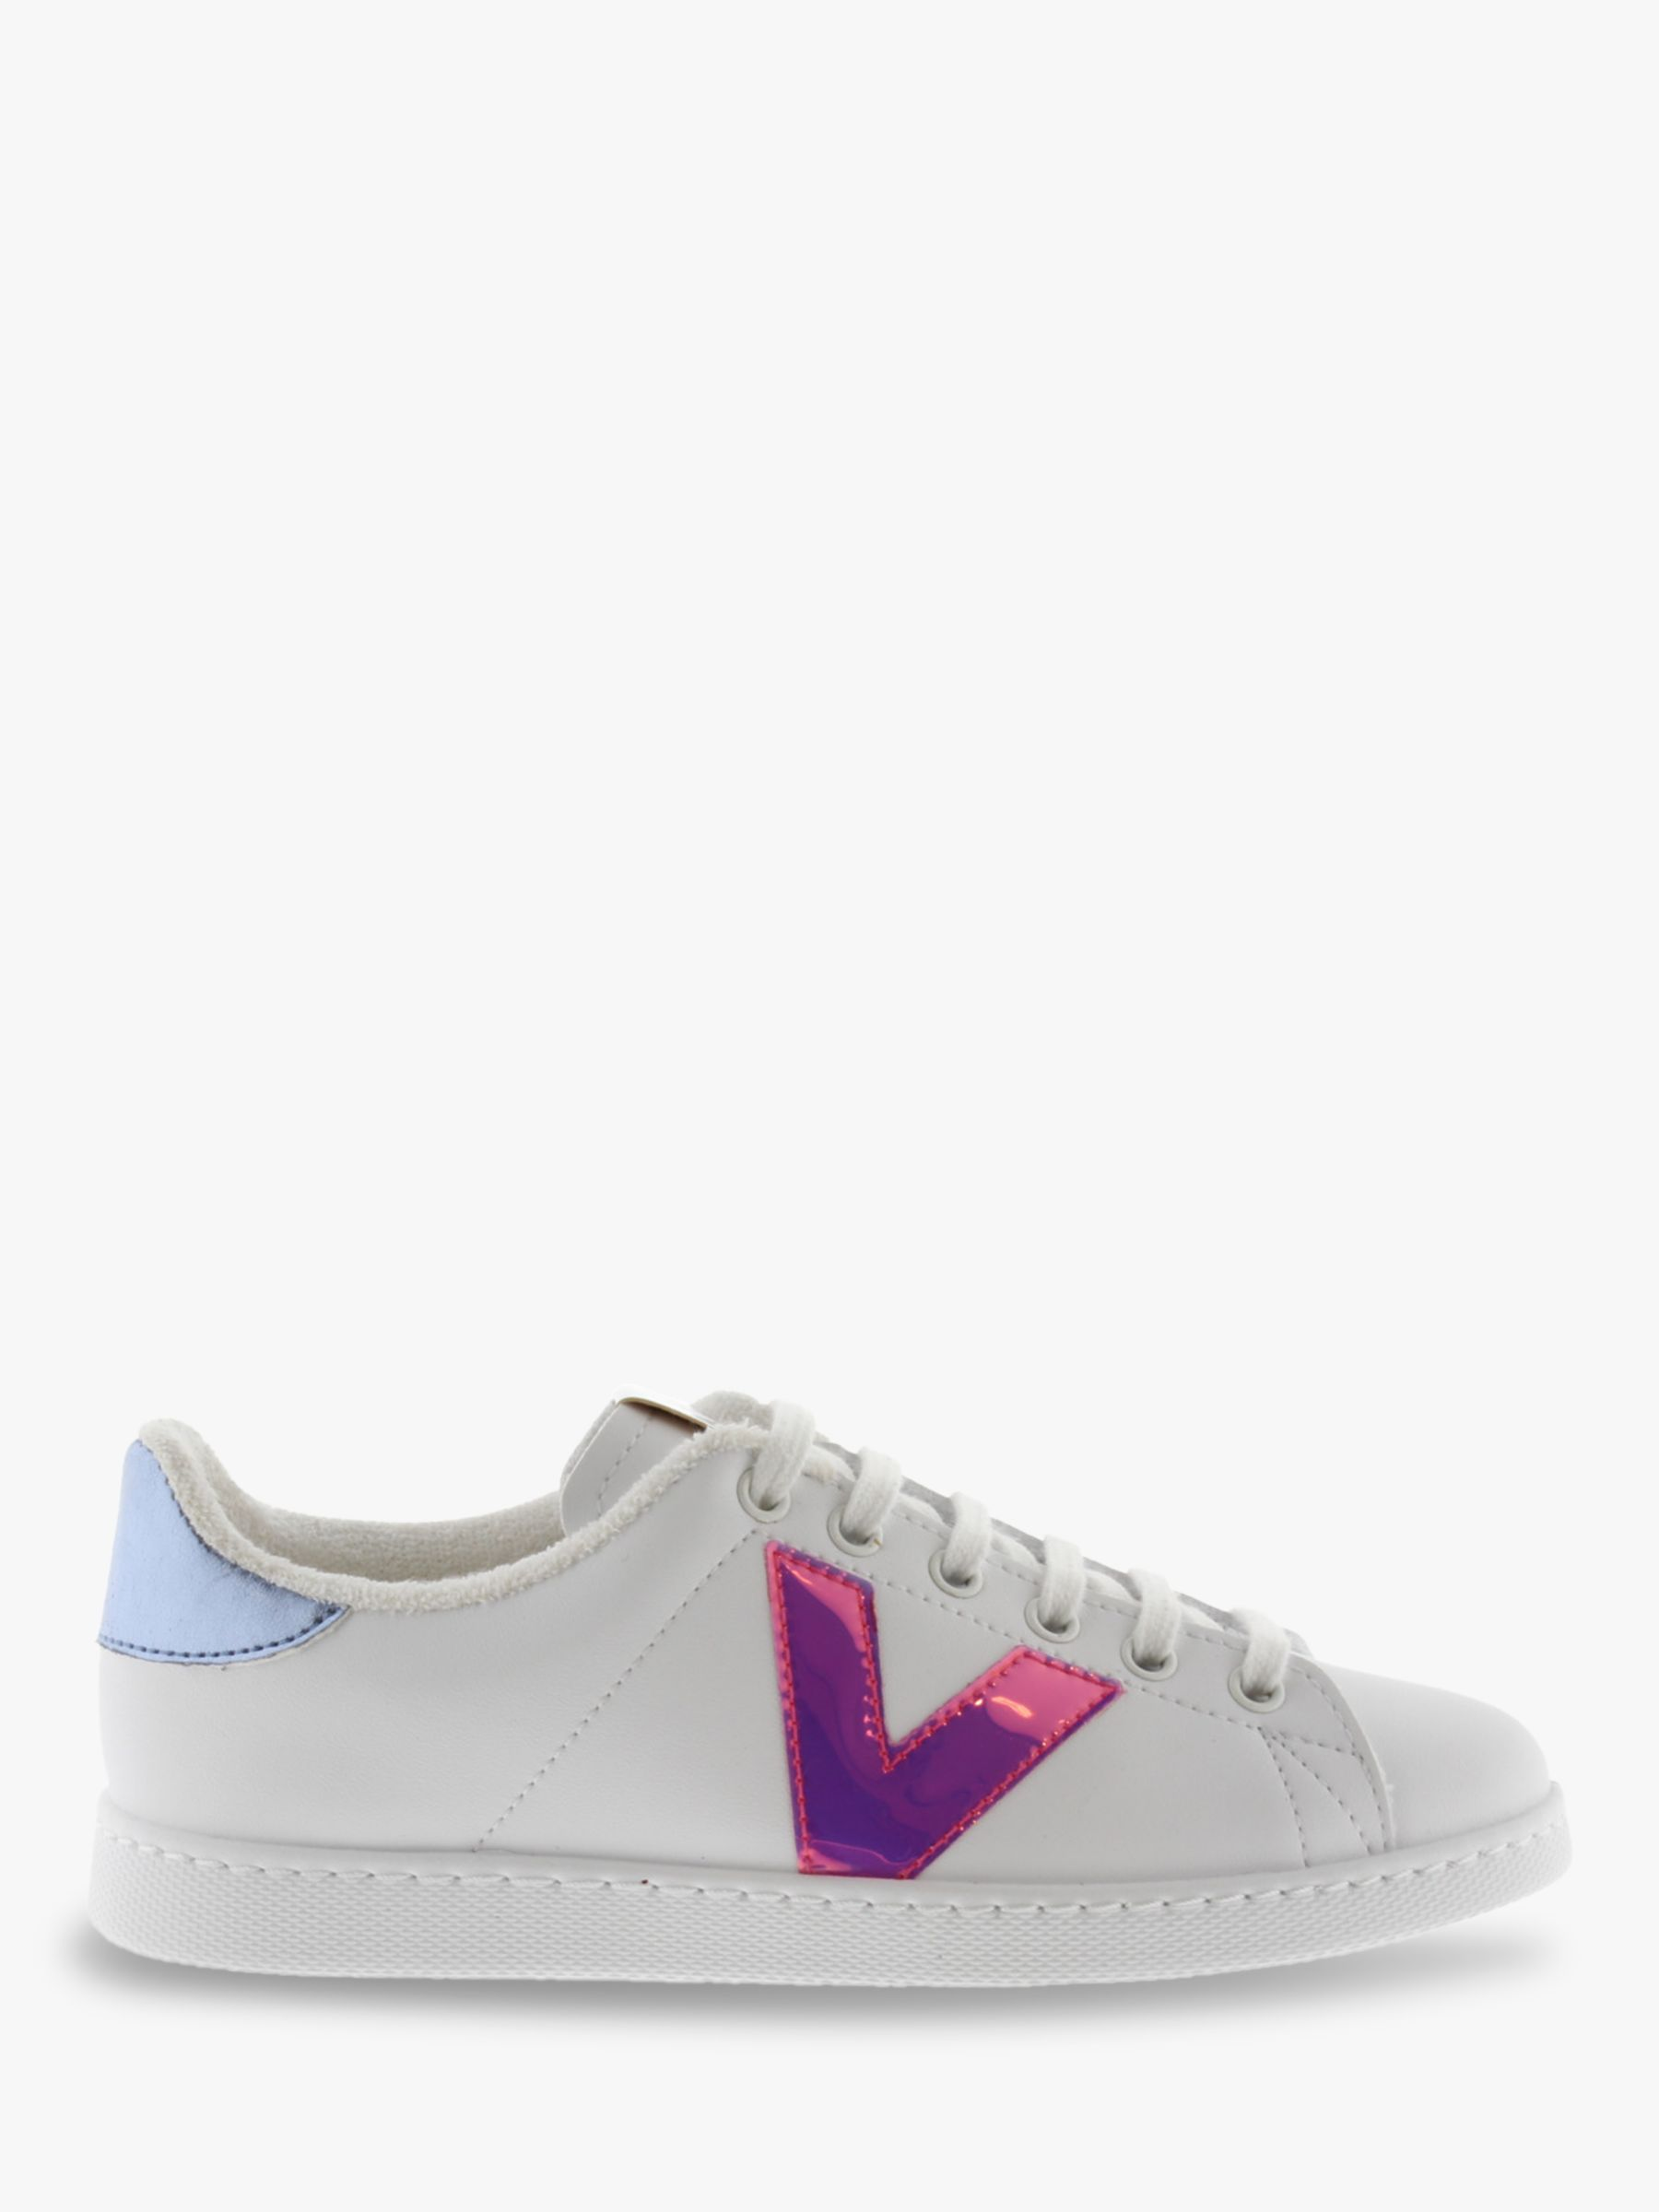 Victoria Shoes Victoria Shoes Tenis Vinilo Trainers, White